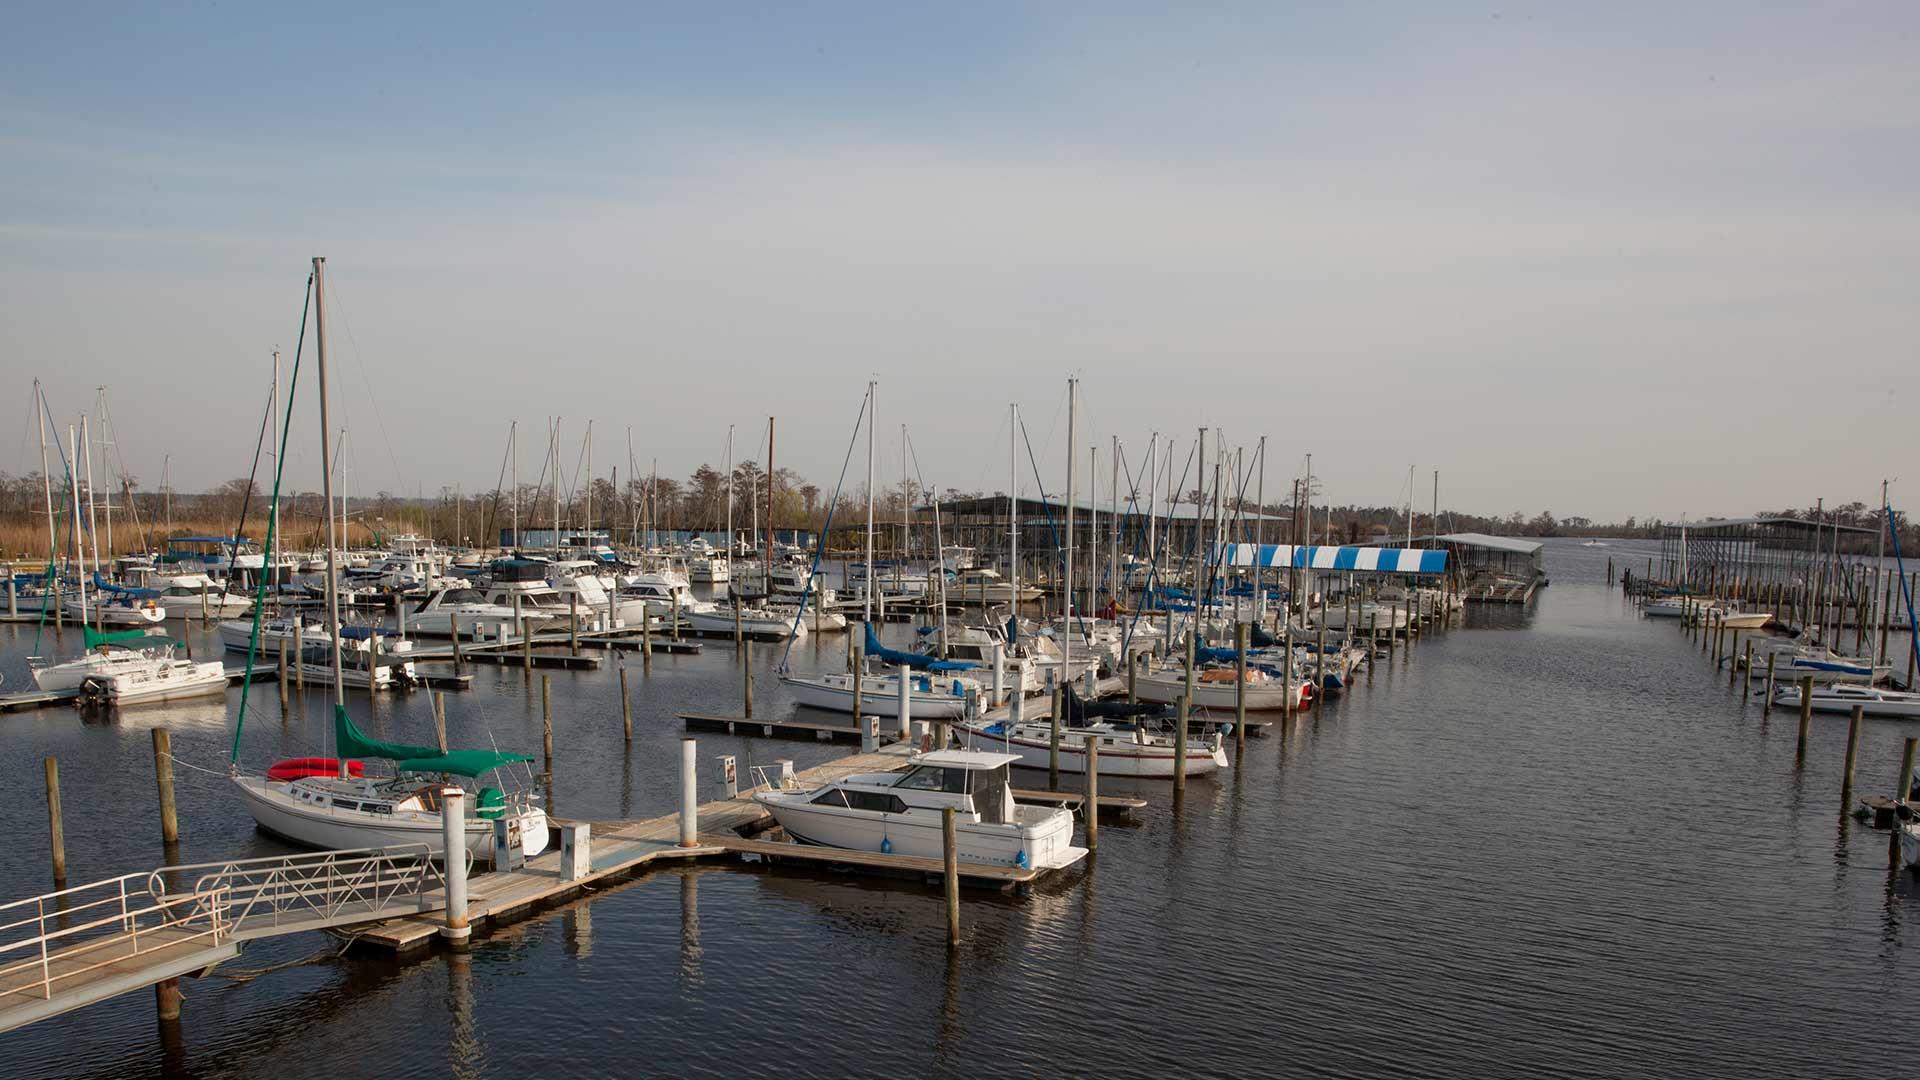 Marina del Ray in Madisonville, LA